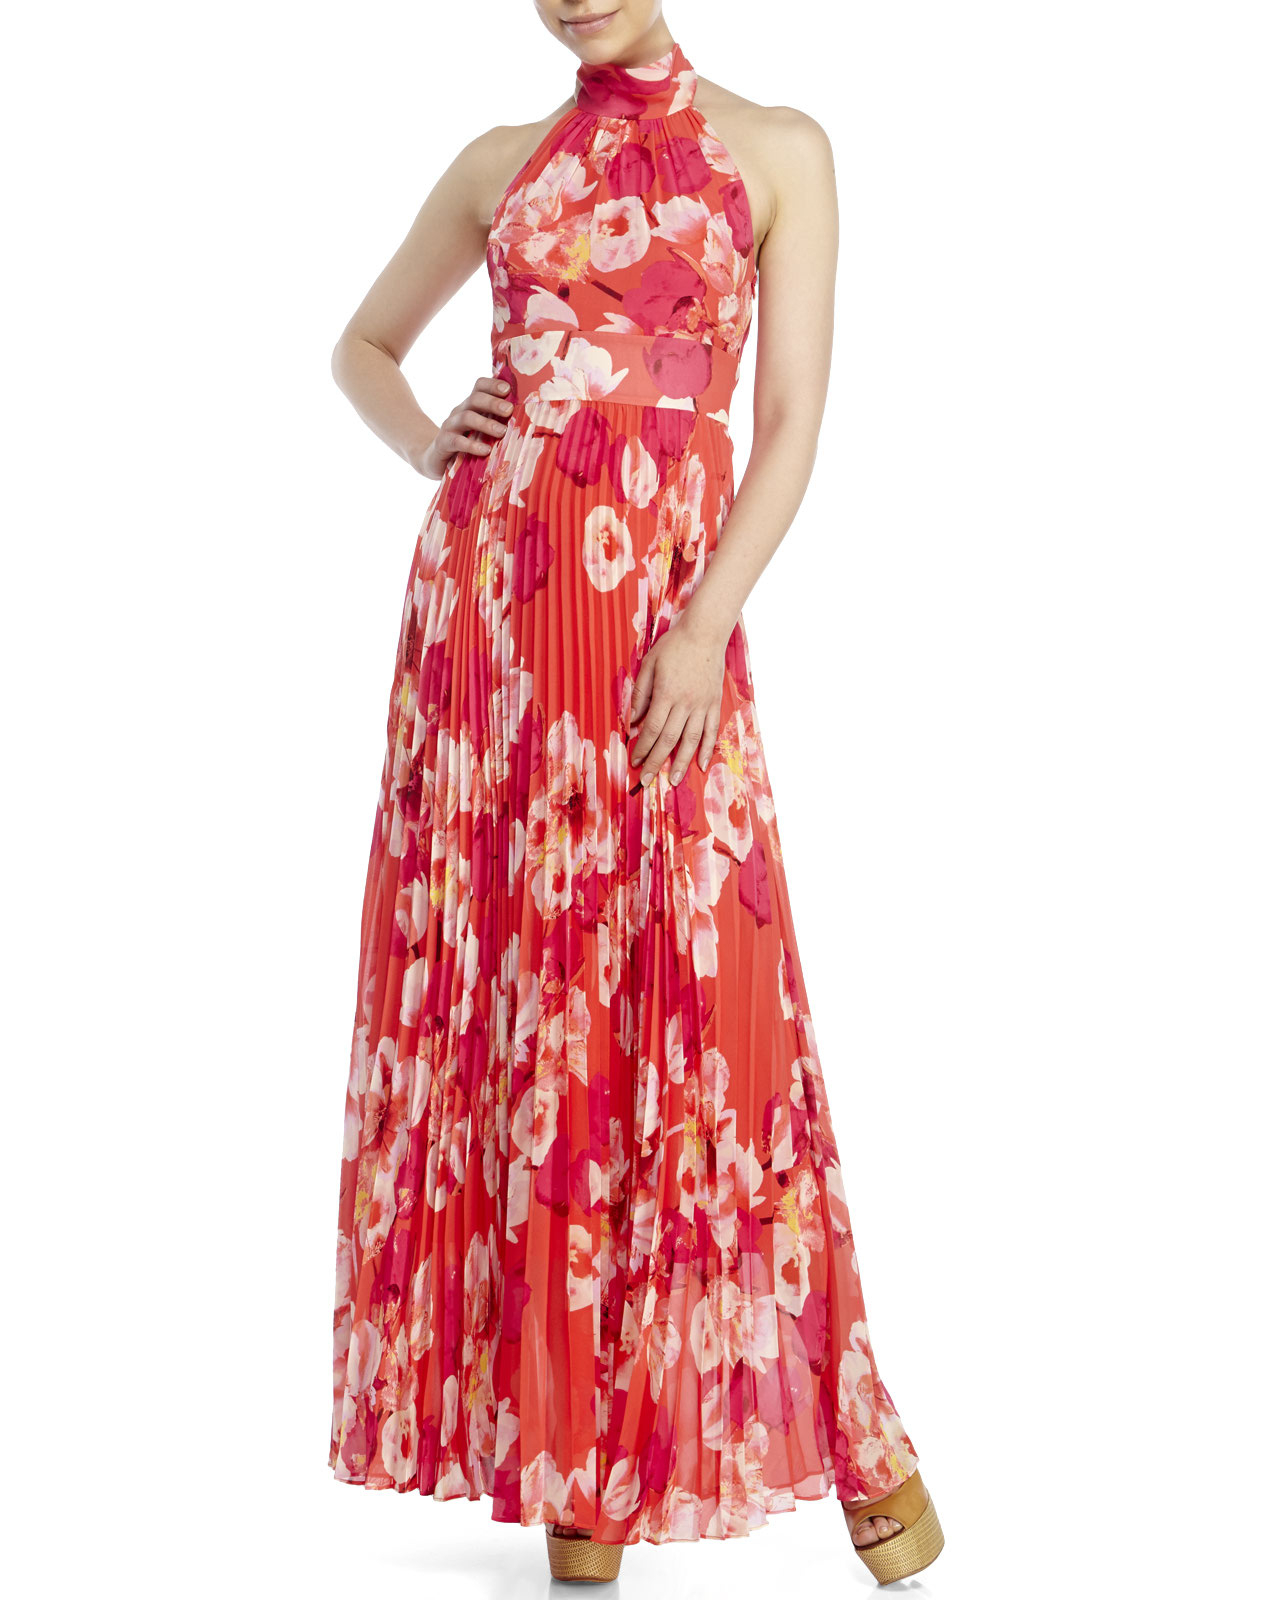 da22b7f6e521 Floral Print Chiffon Maxi Dress Eliza J - raveitsafe